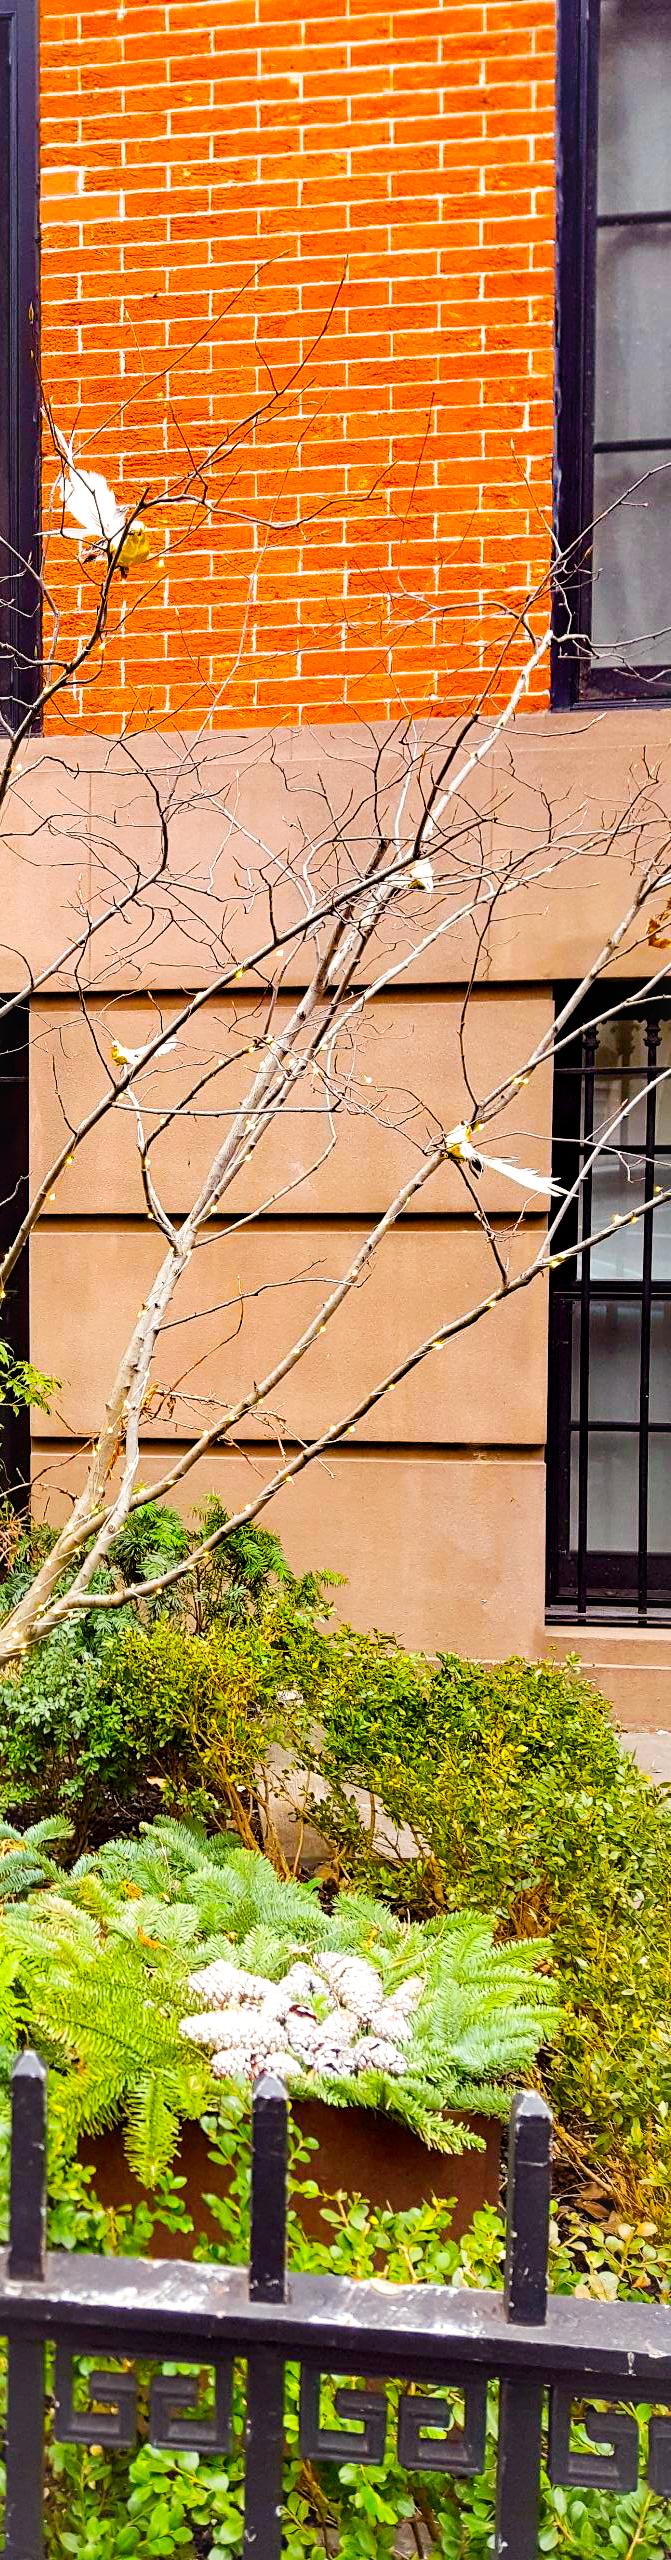 Random Tree with Birds.jpg